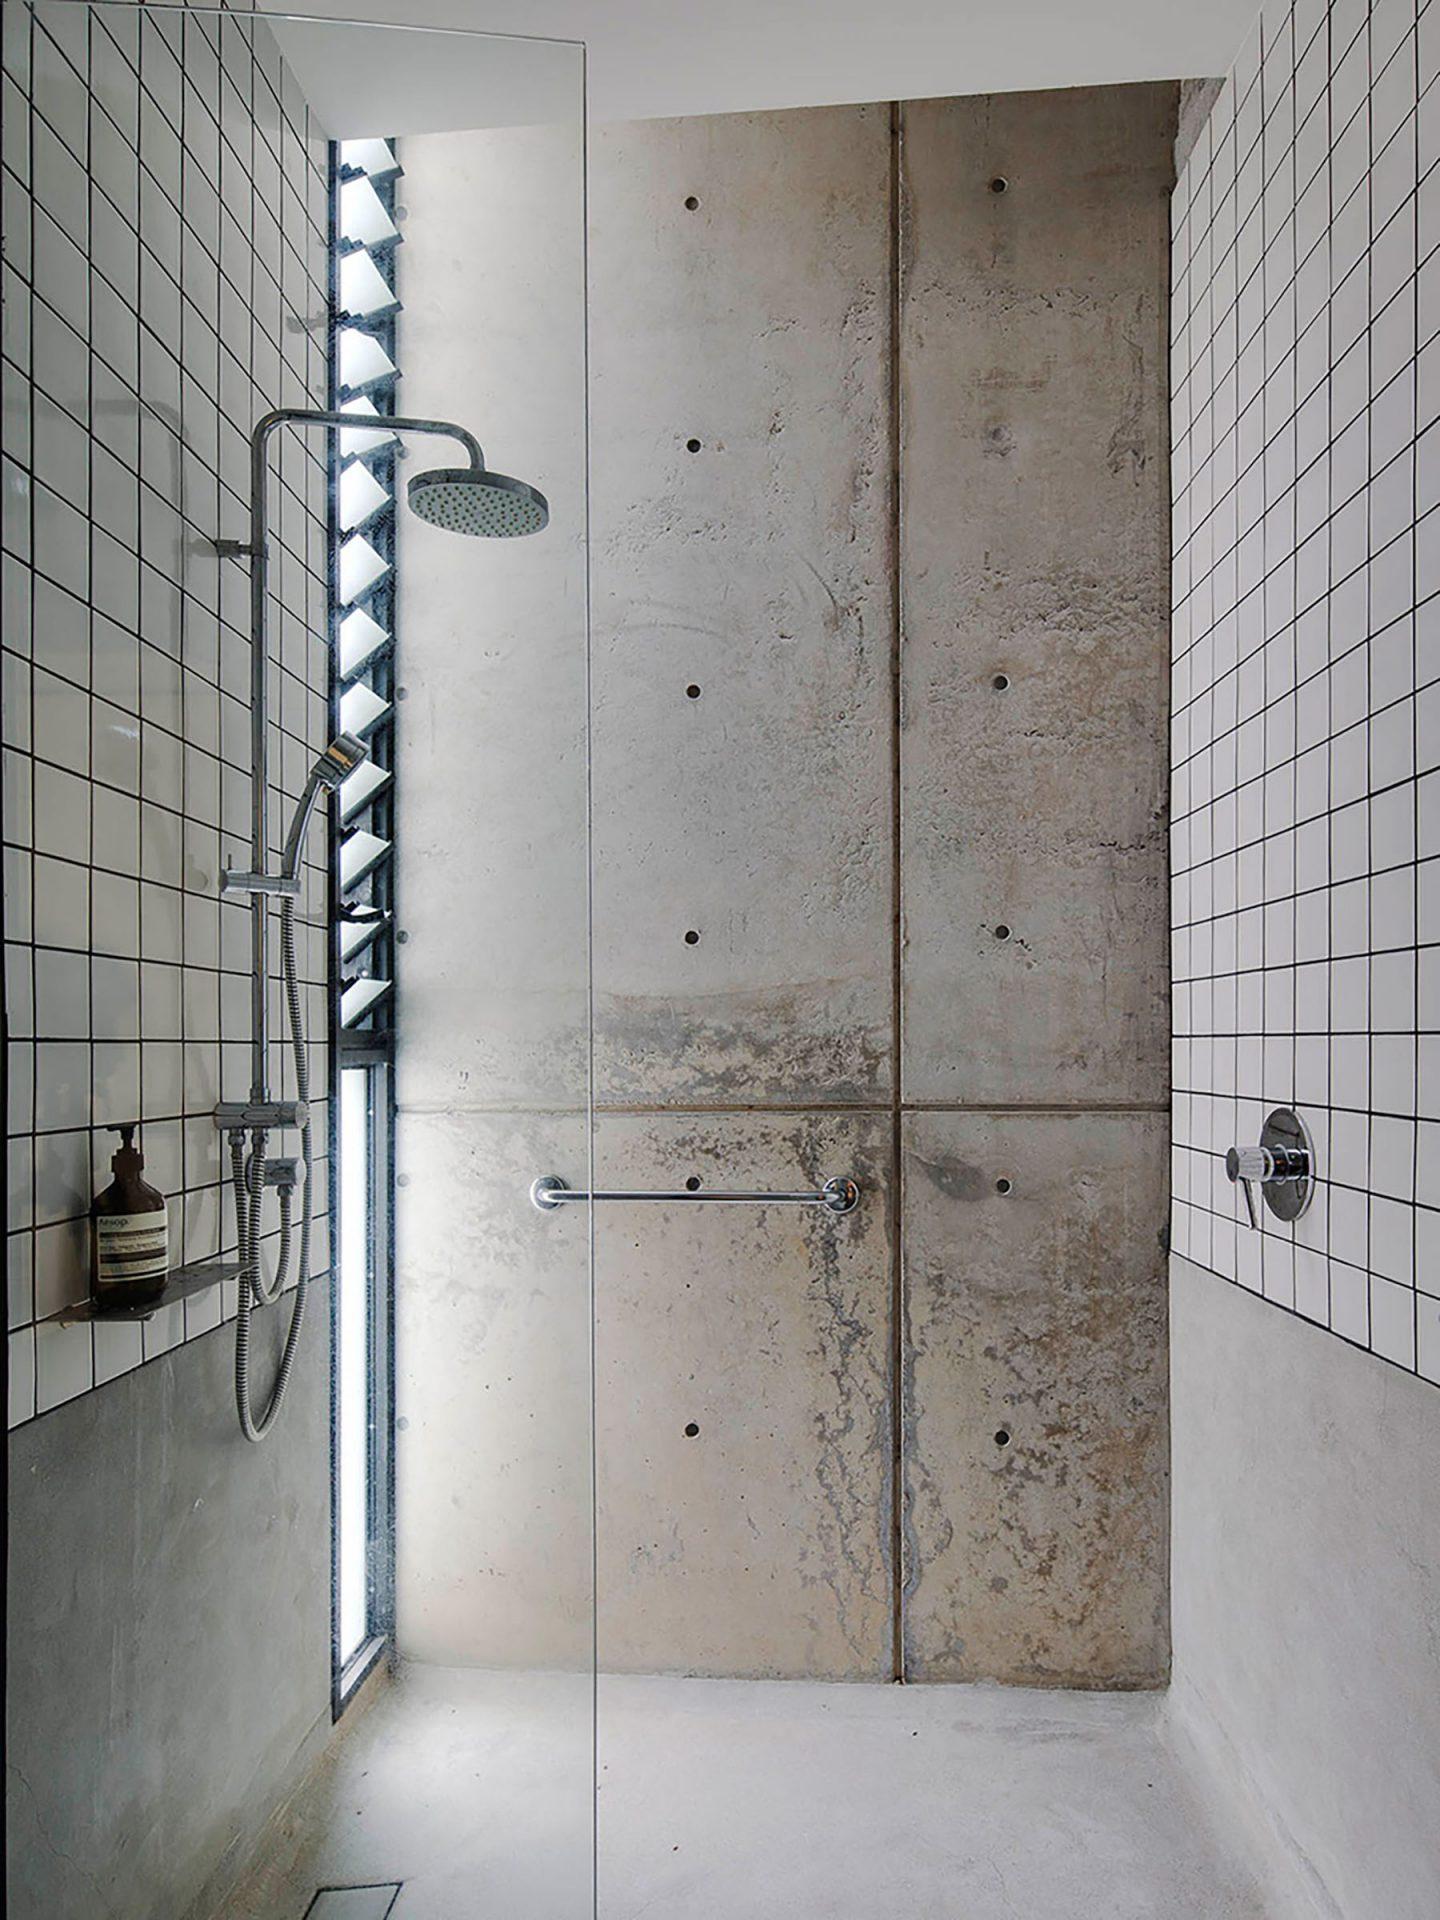 iGNANT-Architecture-Ben-Hosking-Chempenai-016